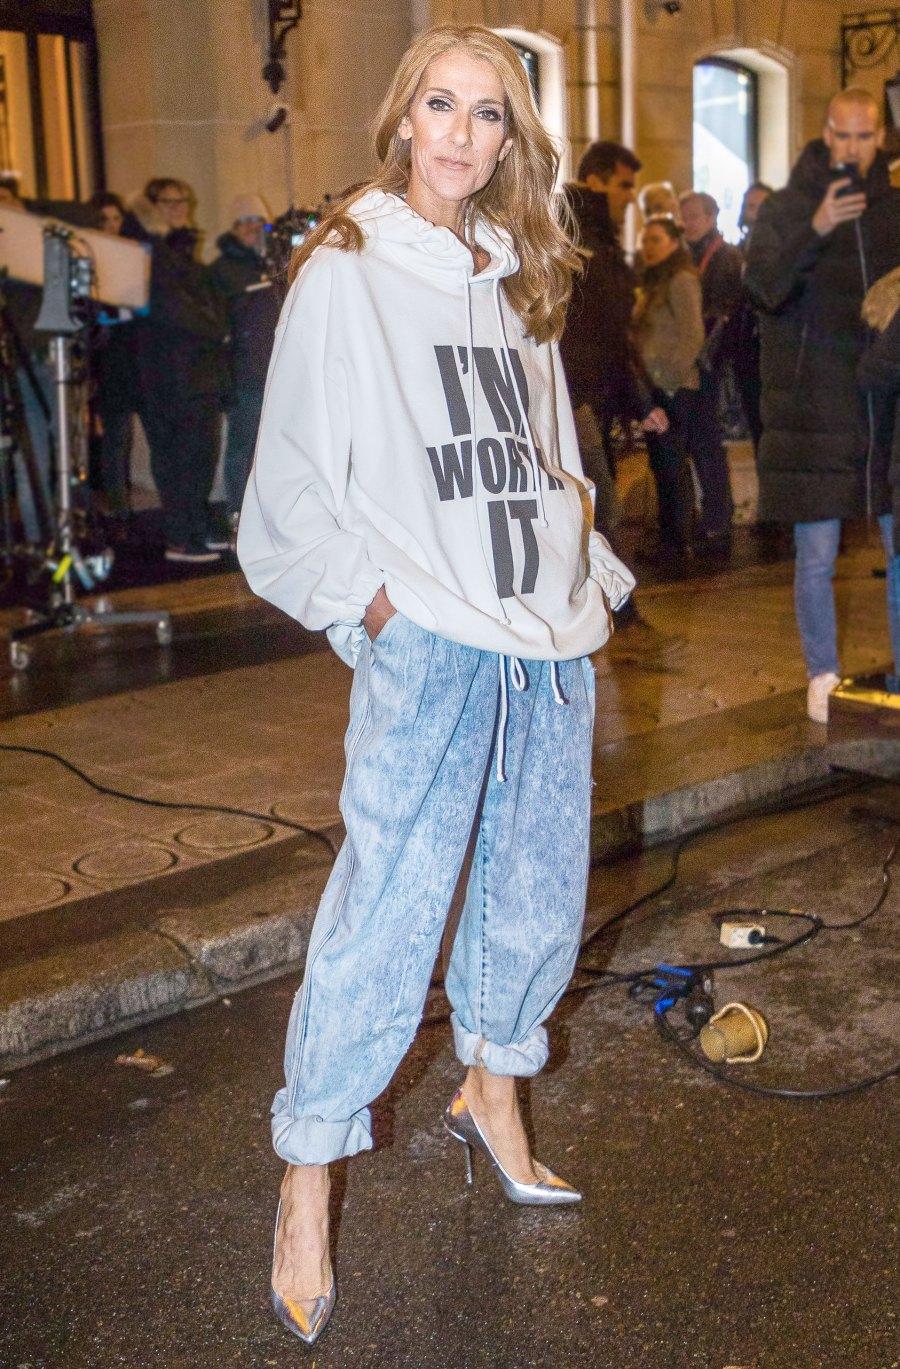 Celine Dion Sweatshirt January 30, 2019